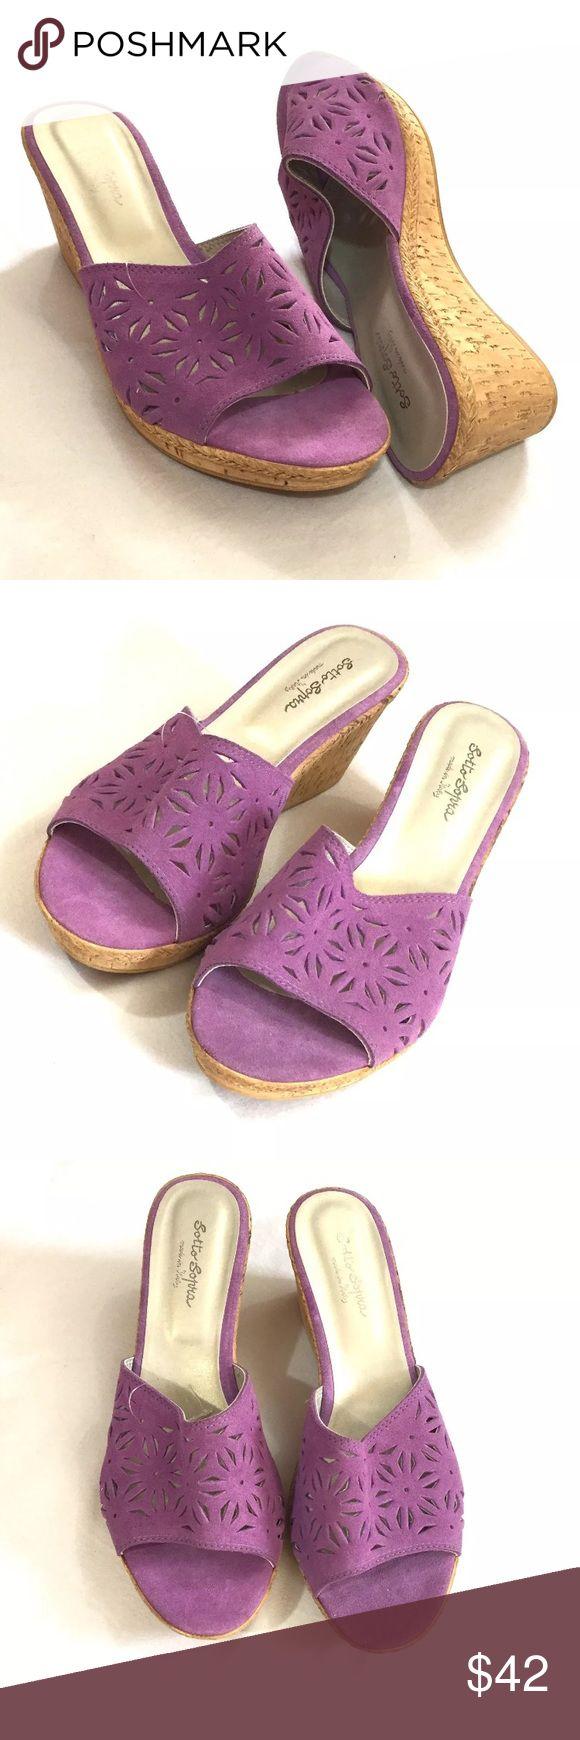 "Sotto Sopra Wedge Sandals Size 11 Purple Laser Cut Sotto Sopra purple laser cut suede uppers on a 3"" cork wedge bottom. Never worn. Sotto Sopra Shoes Wedges"